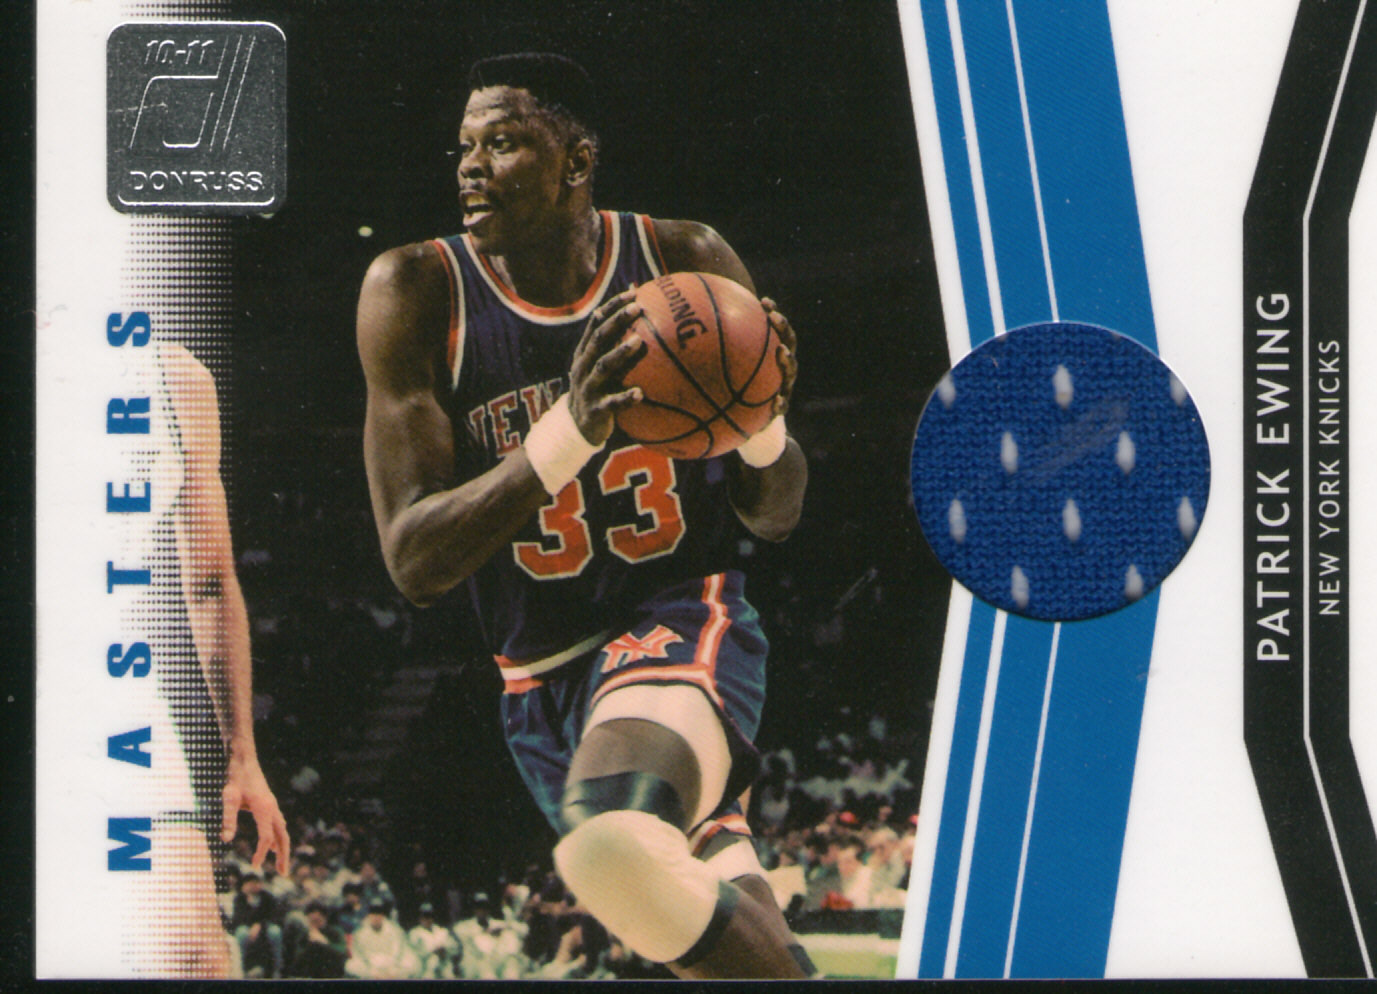 Patrick Ewing relic card 2010 Donruss